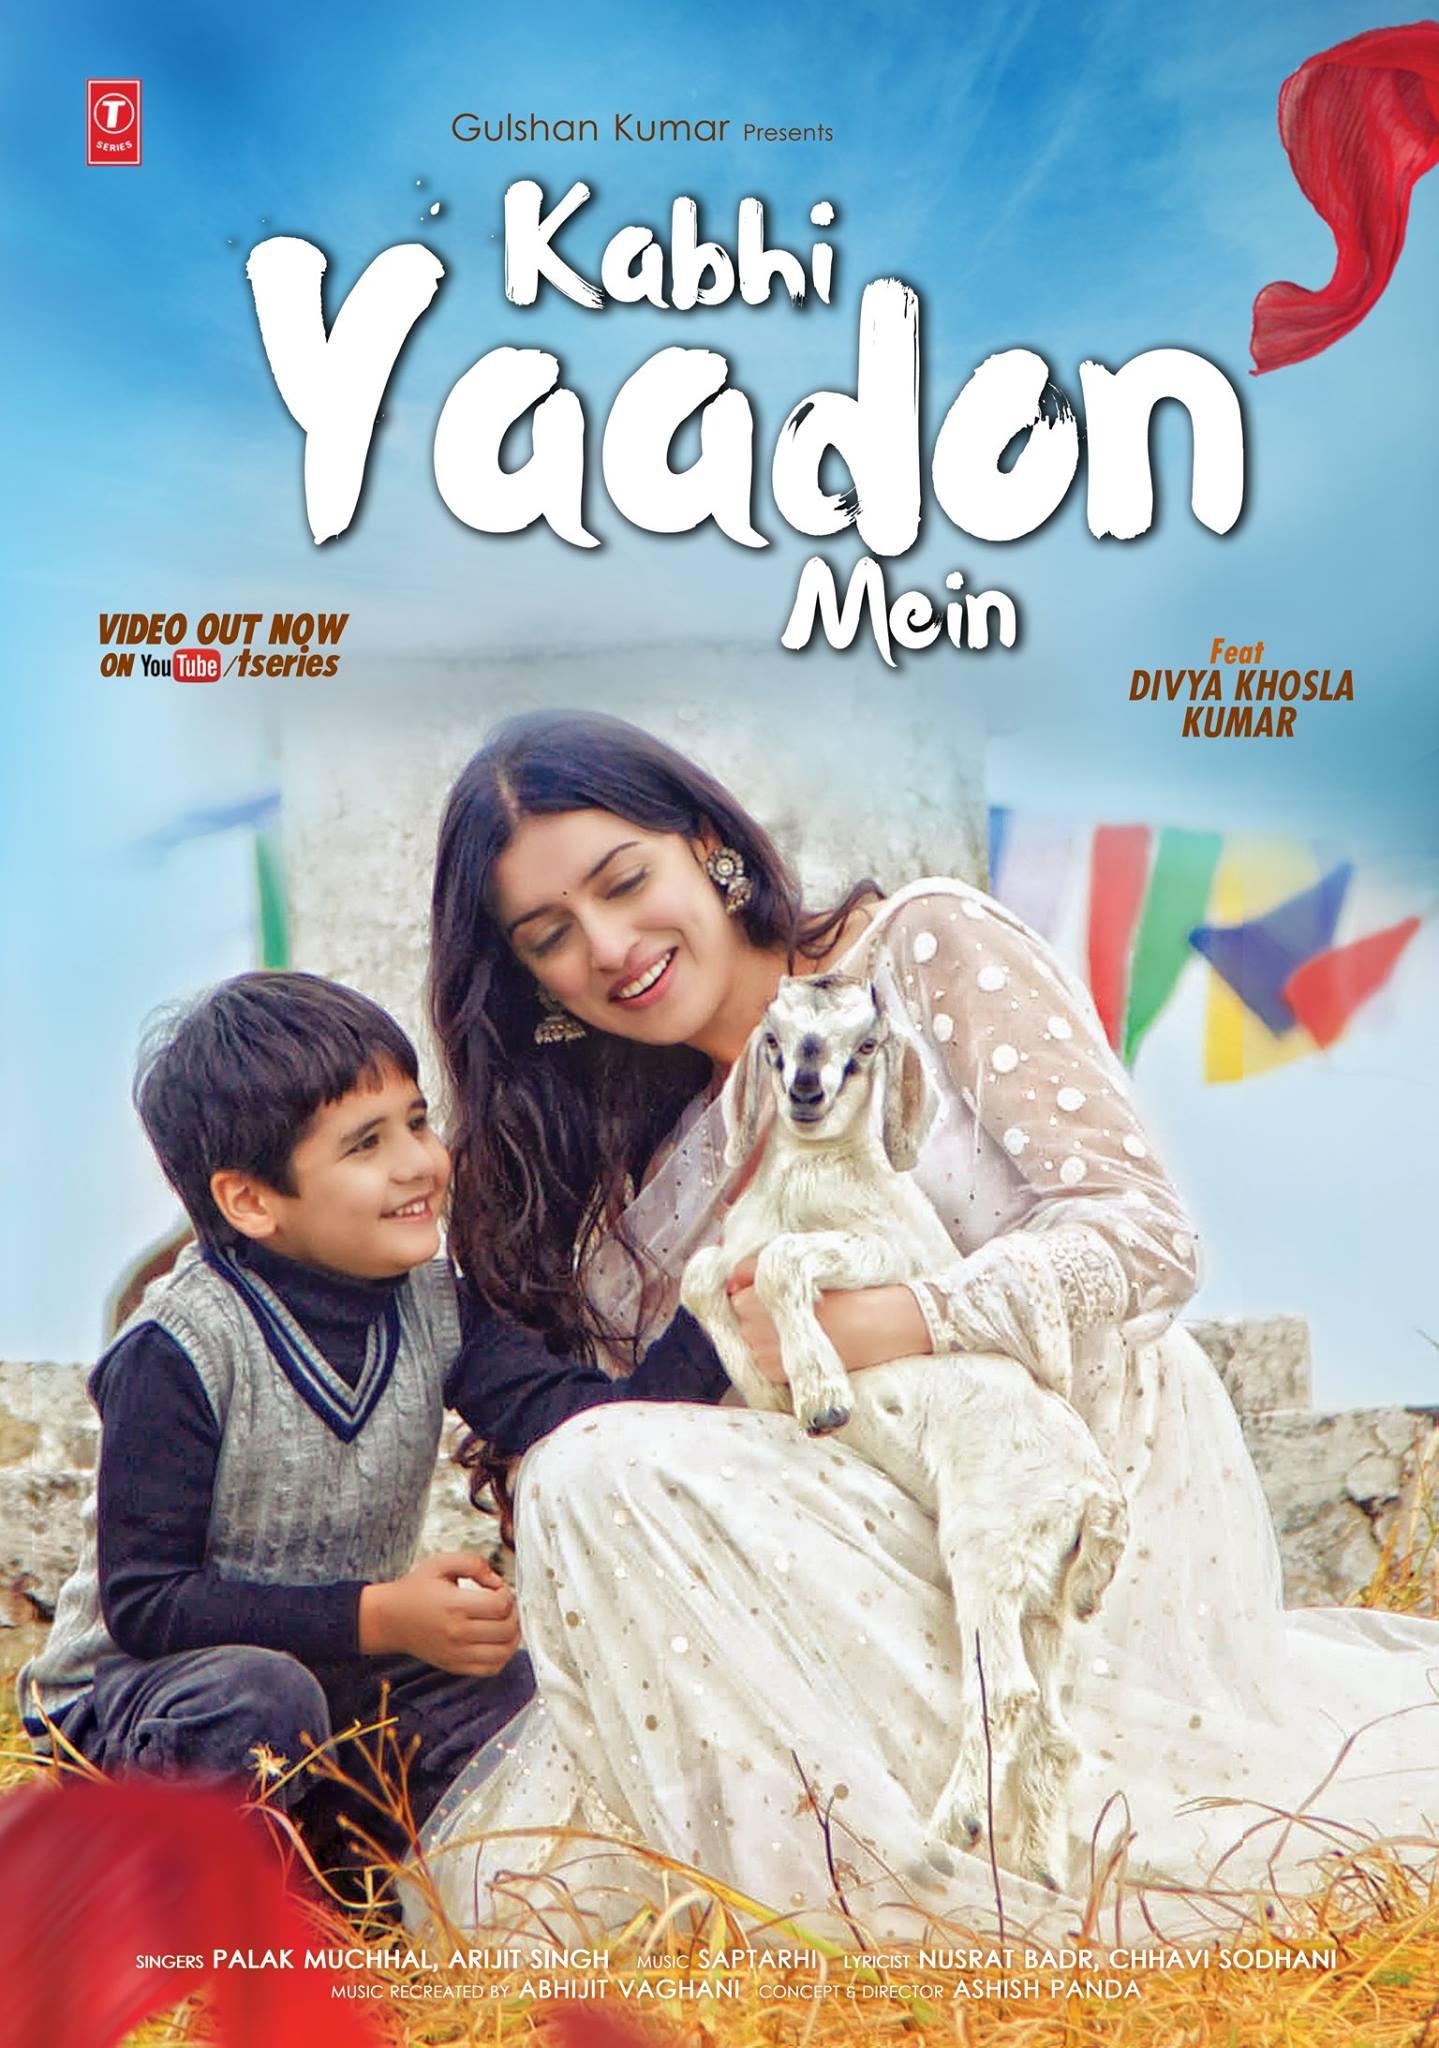 Watch Kabhi yadon mein featuring  Divya Khosla Kumar 1